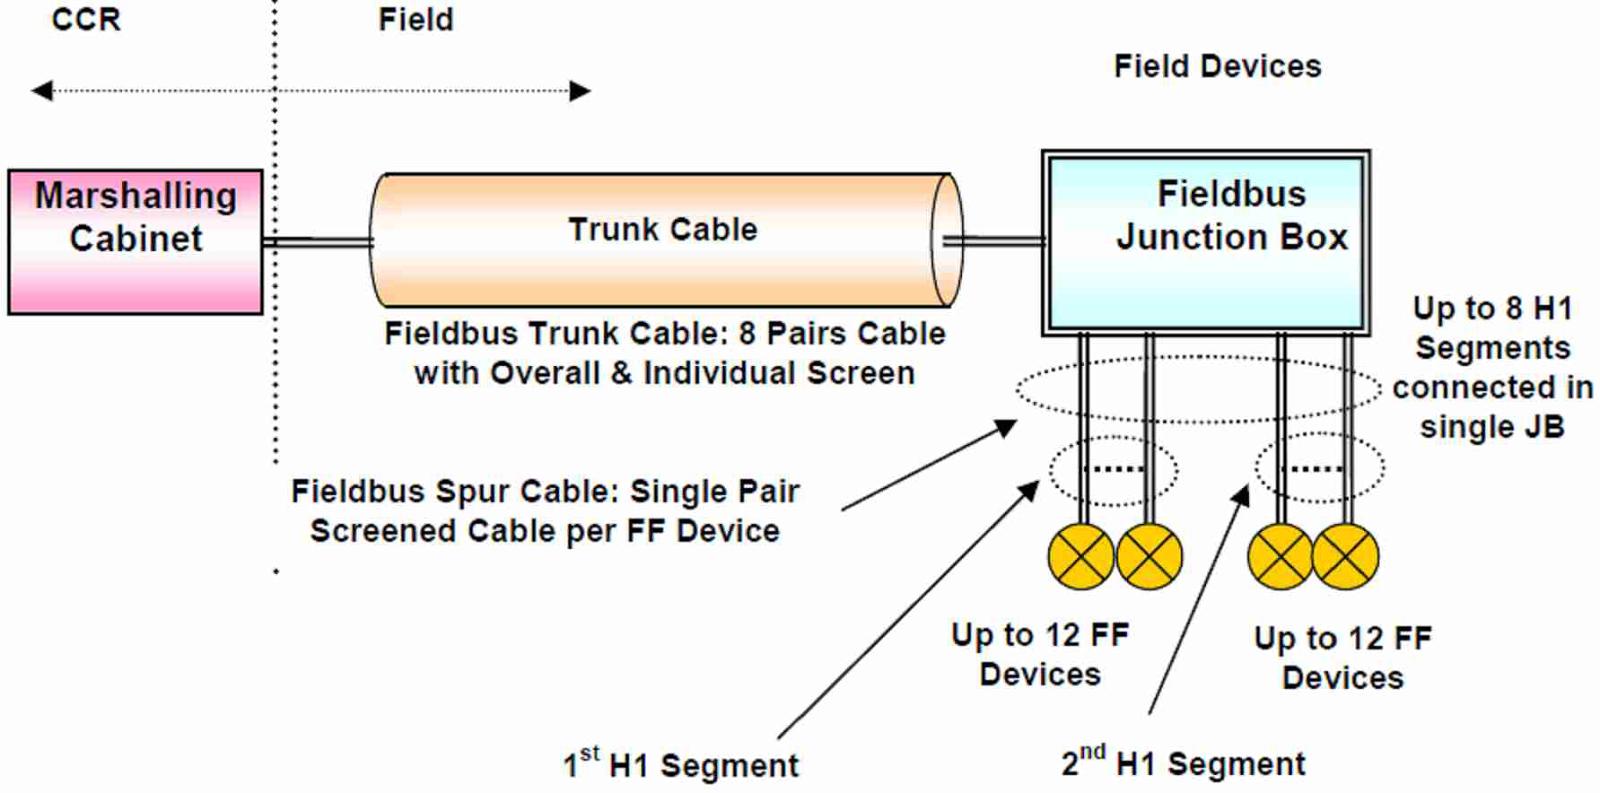 foundation fieldbus segment wiring design requirements paktechpoint rh paktechpoint com